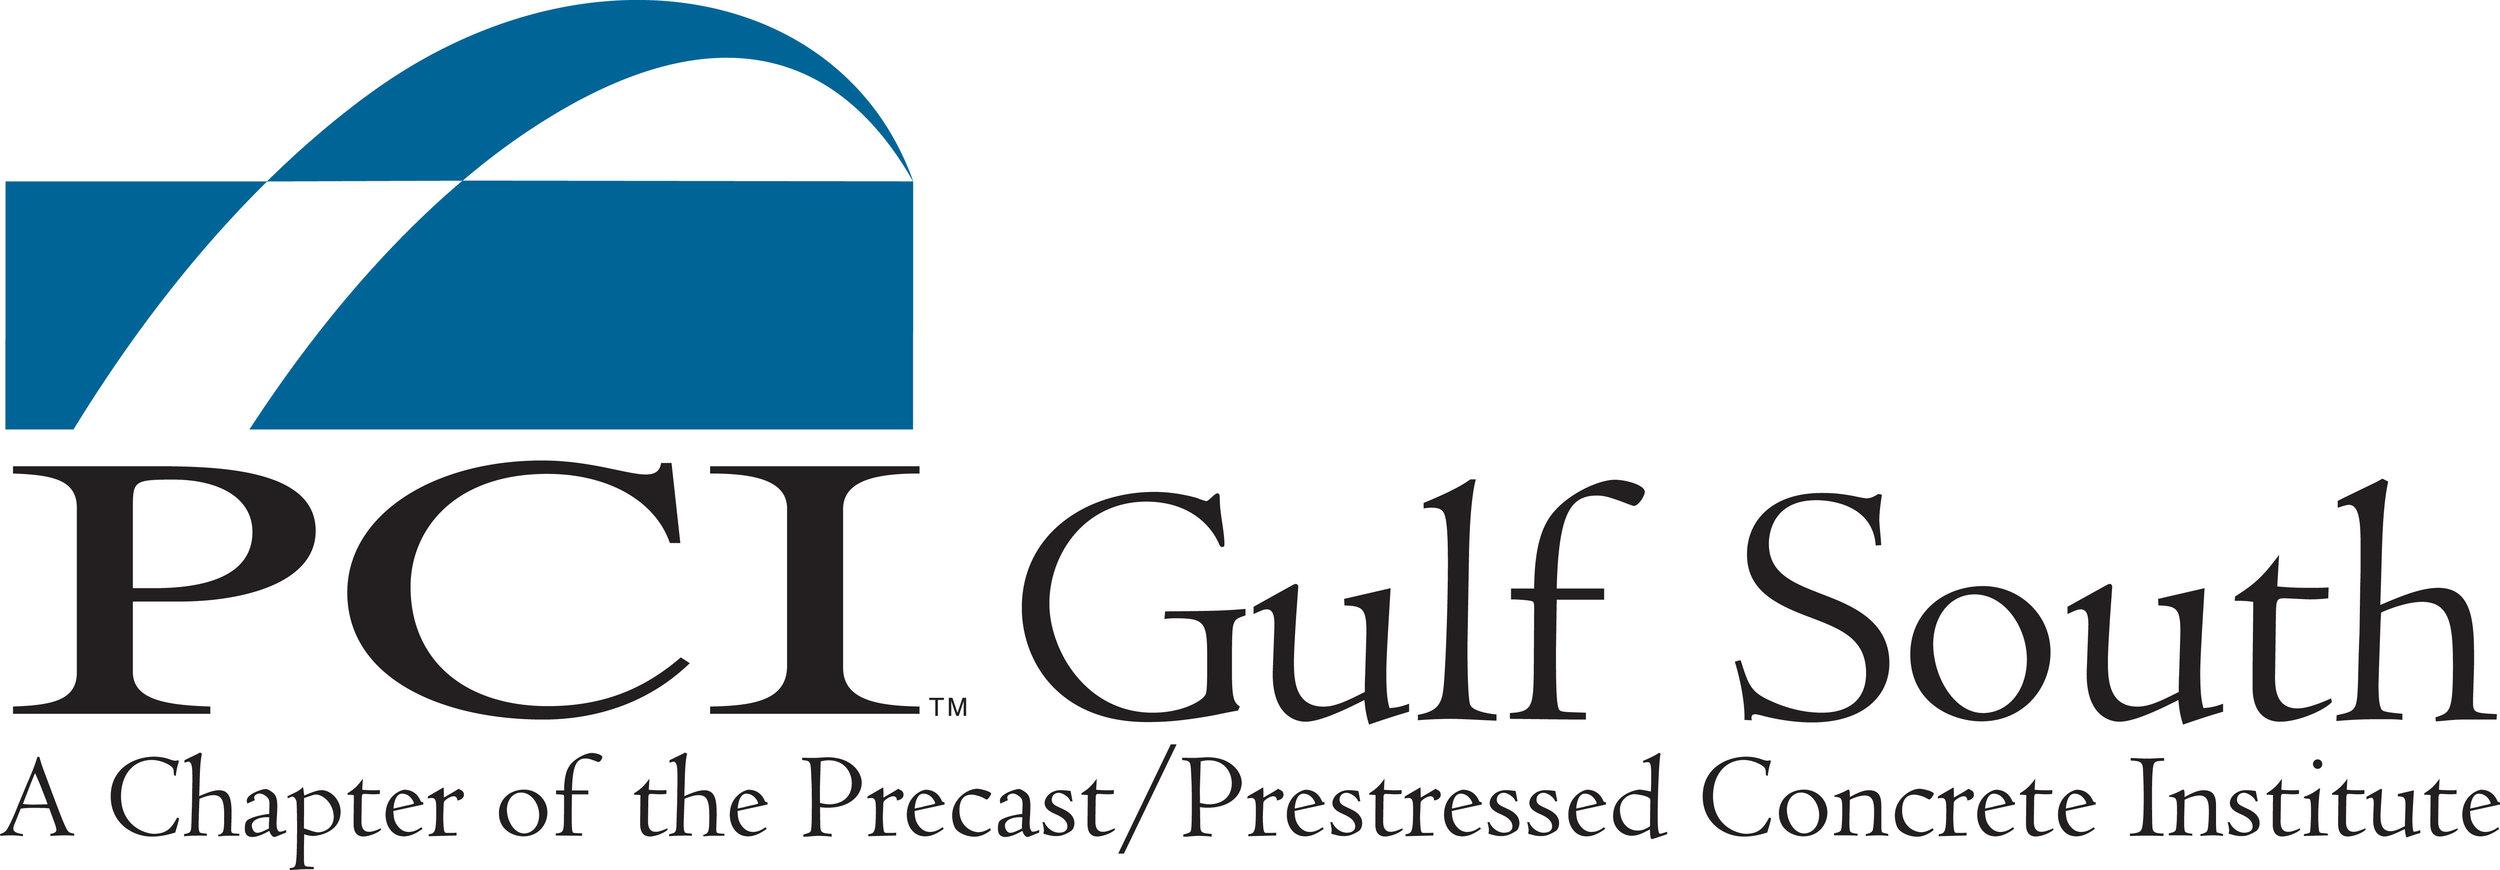 PCI Gulf South Logo Horizontal 2-11-16(1).jpg